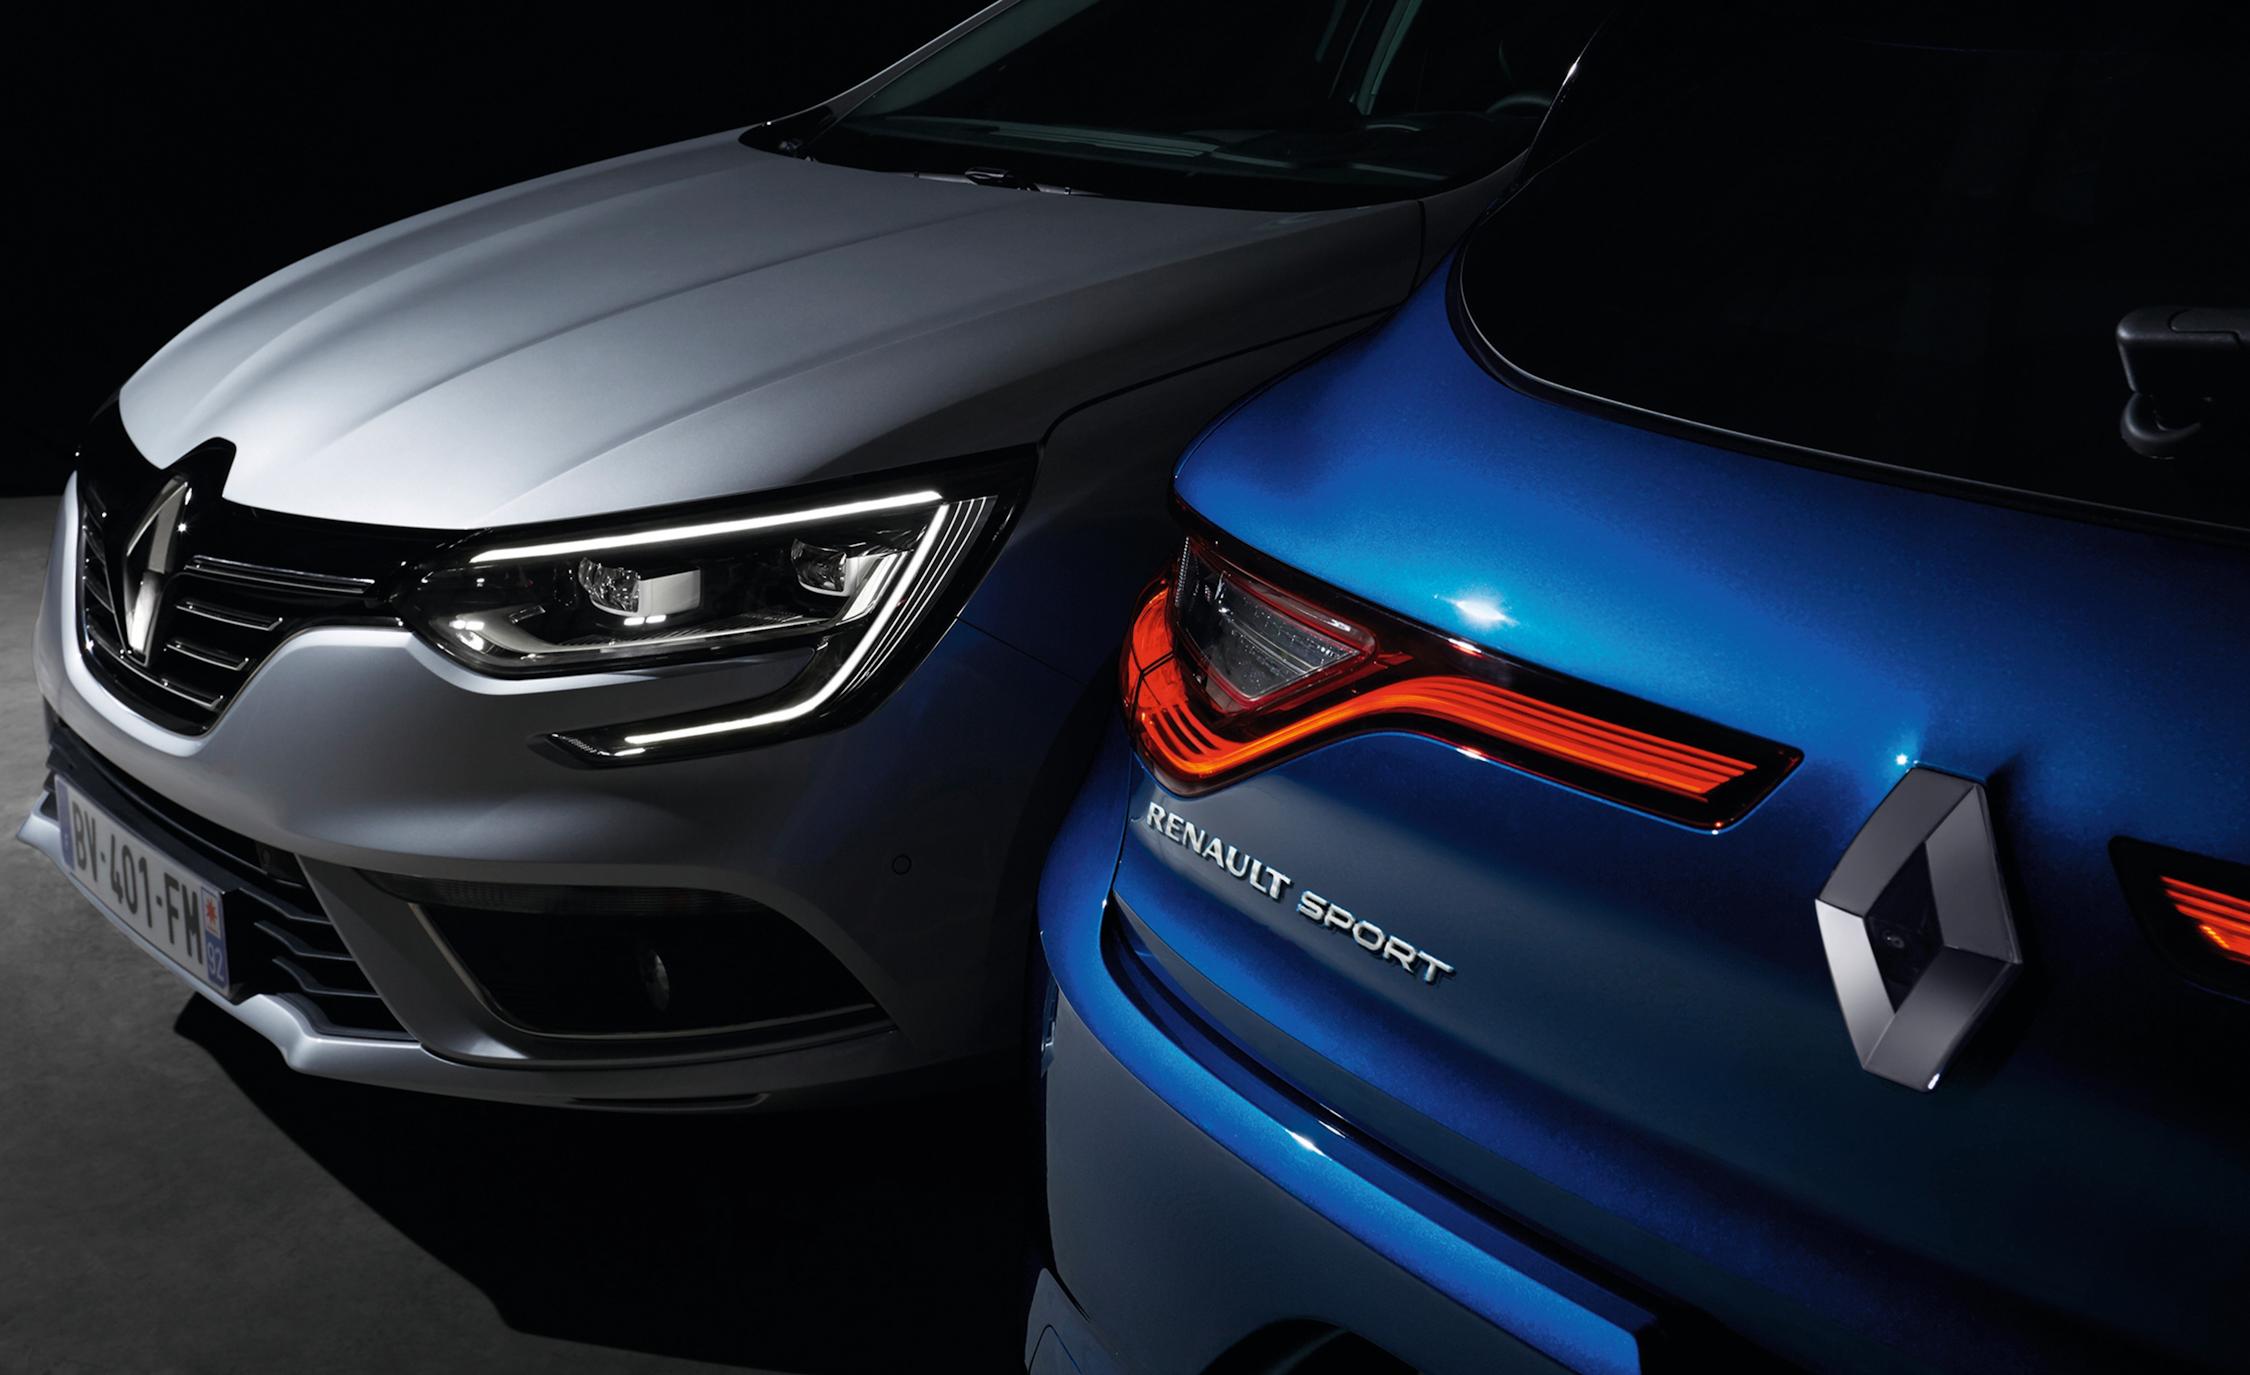 Renault Megane And Renault Megane Sport (Photo 27 of 27)